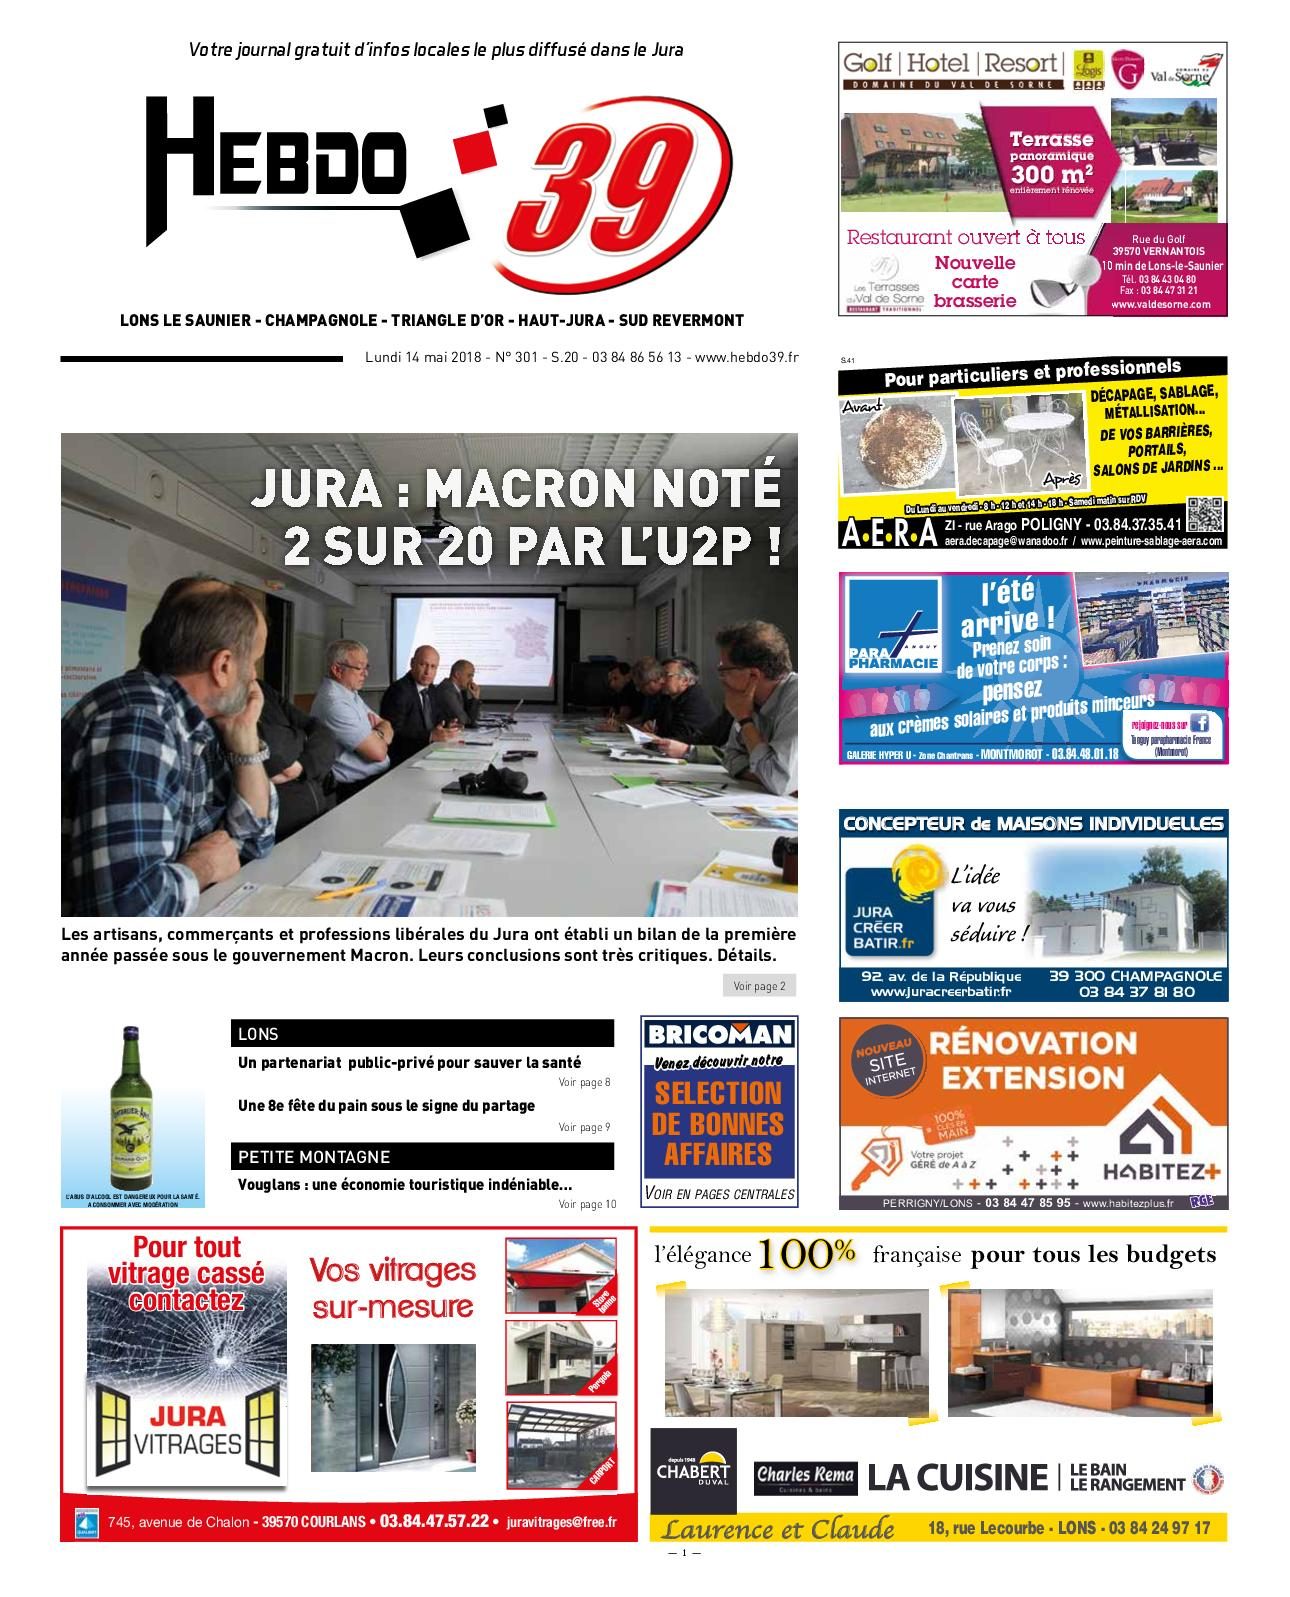 Calaméo - Hebdo Lons Semaine 20 2018 pour Bordure P1 Bricoman